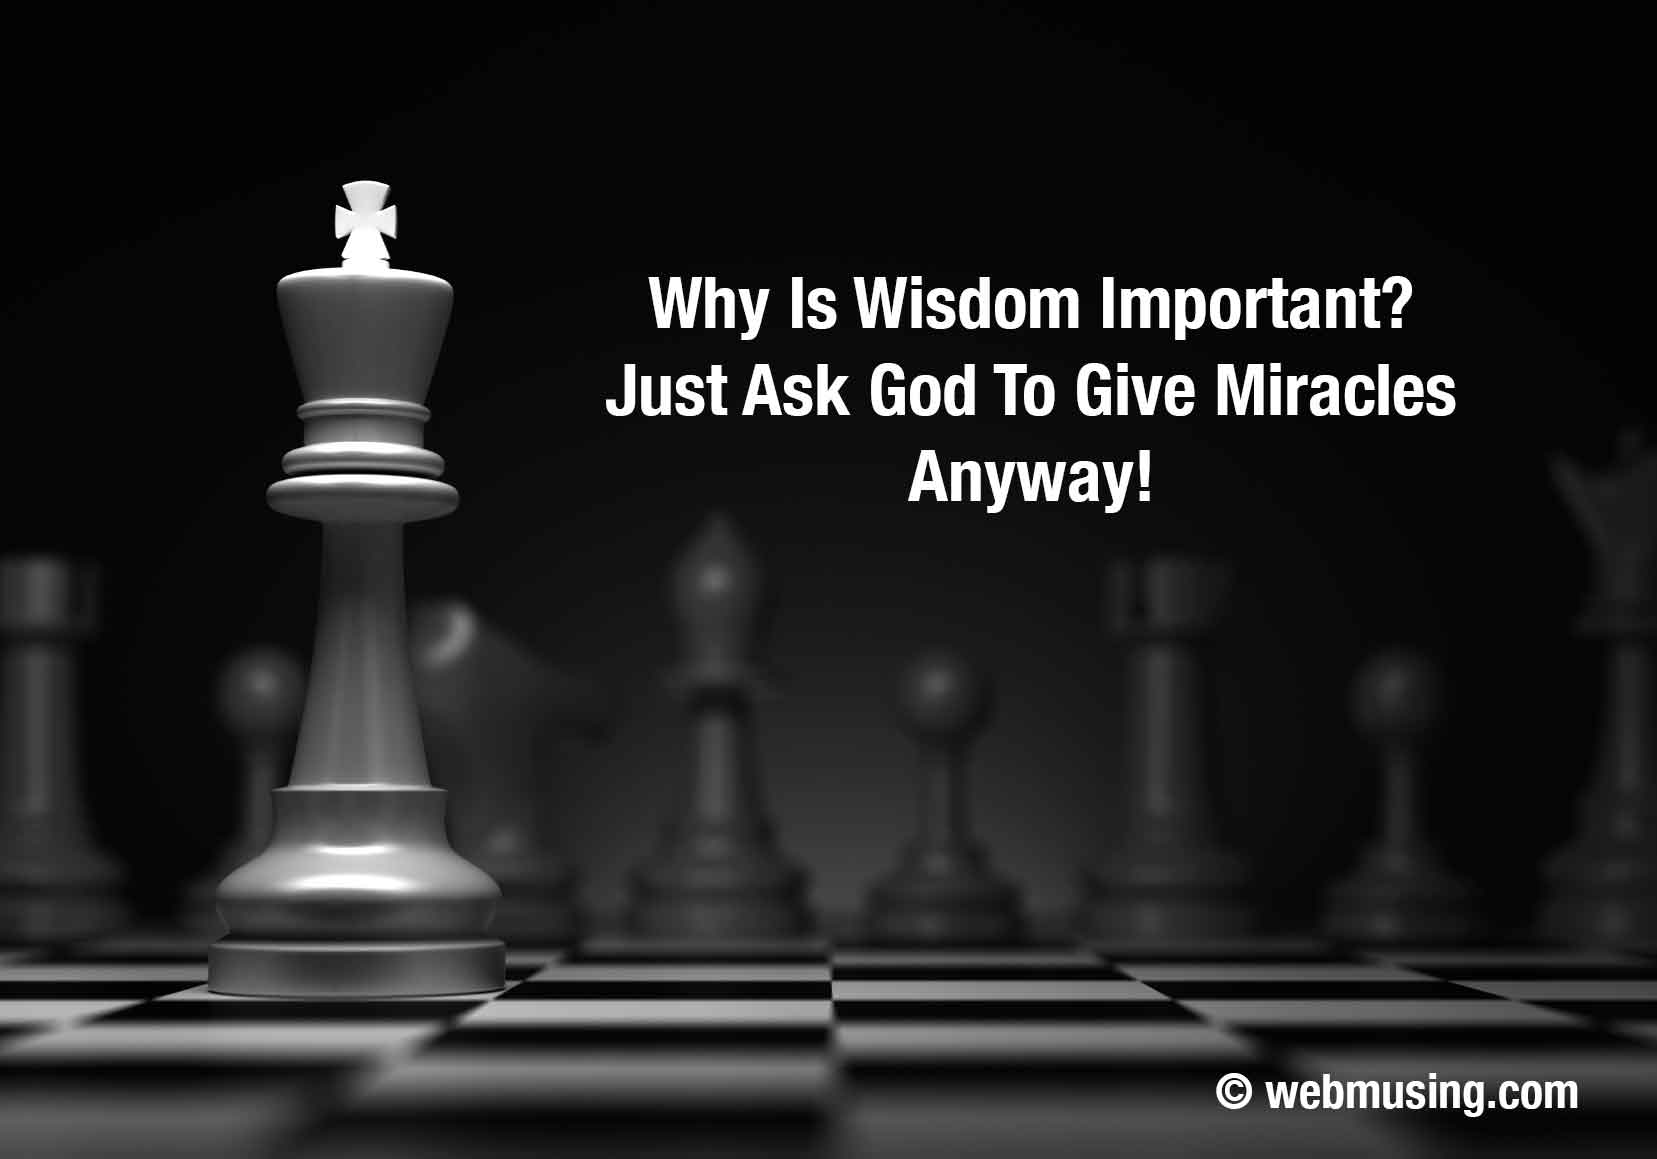 Musing on Wisdom